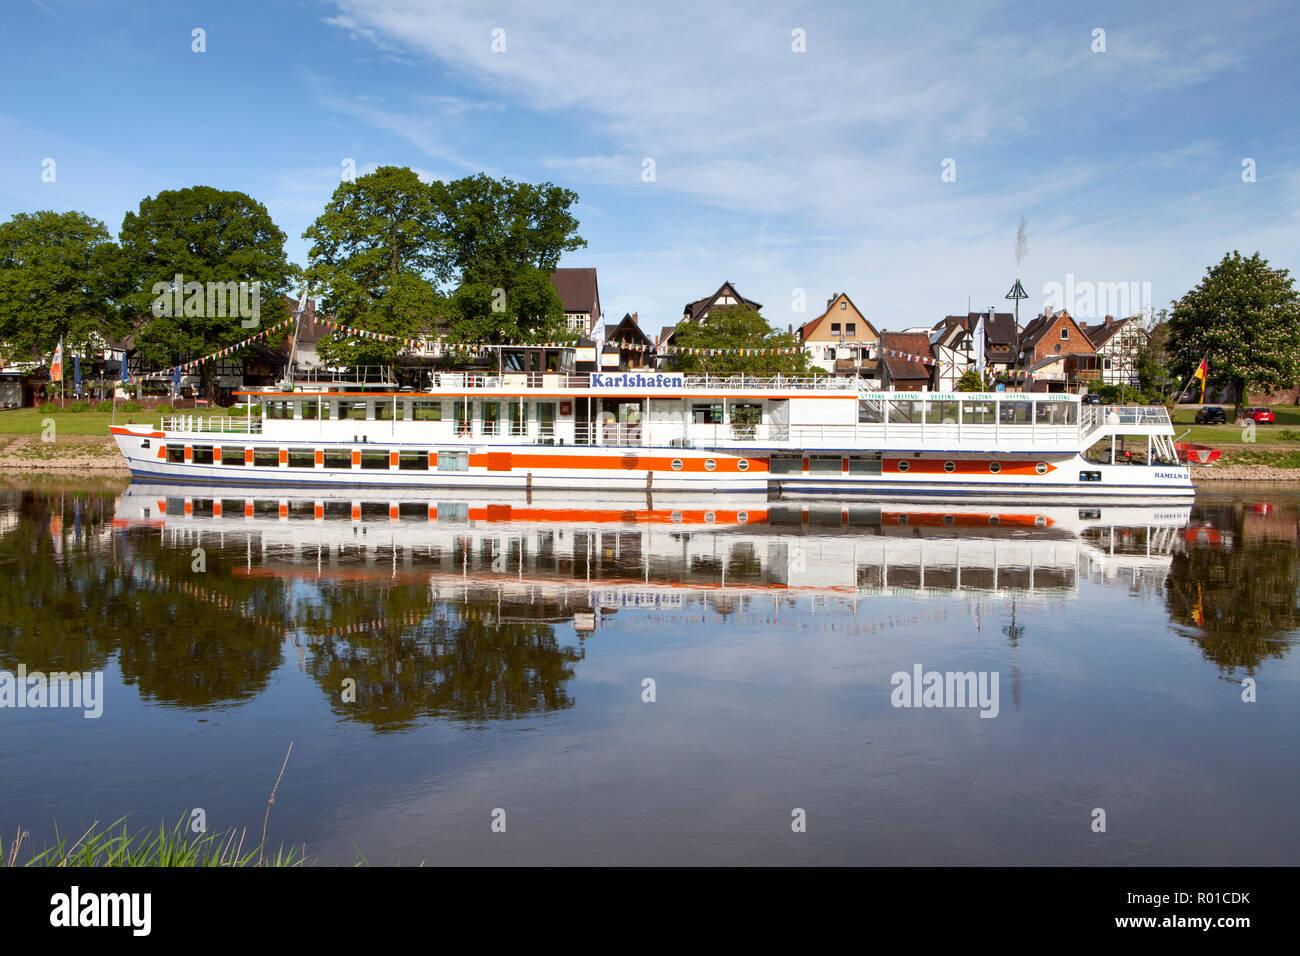 Navire à passagers Karlshafen, Bodenwerder, berceau du Baron Muenchhausen, Weserbergland, Basse-Saxe, Allemagne, Europe Banque D'Images